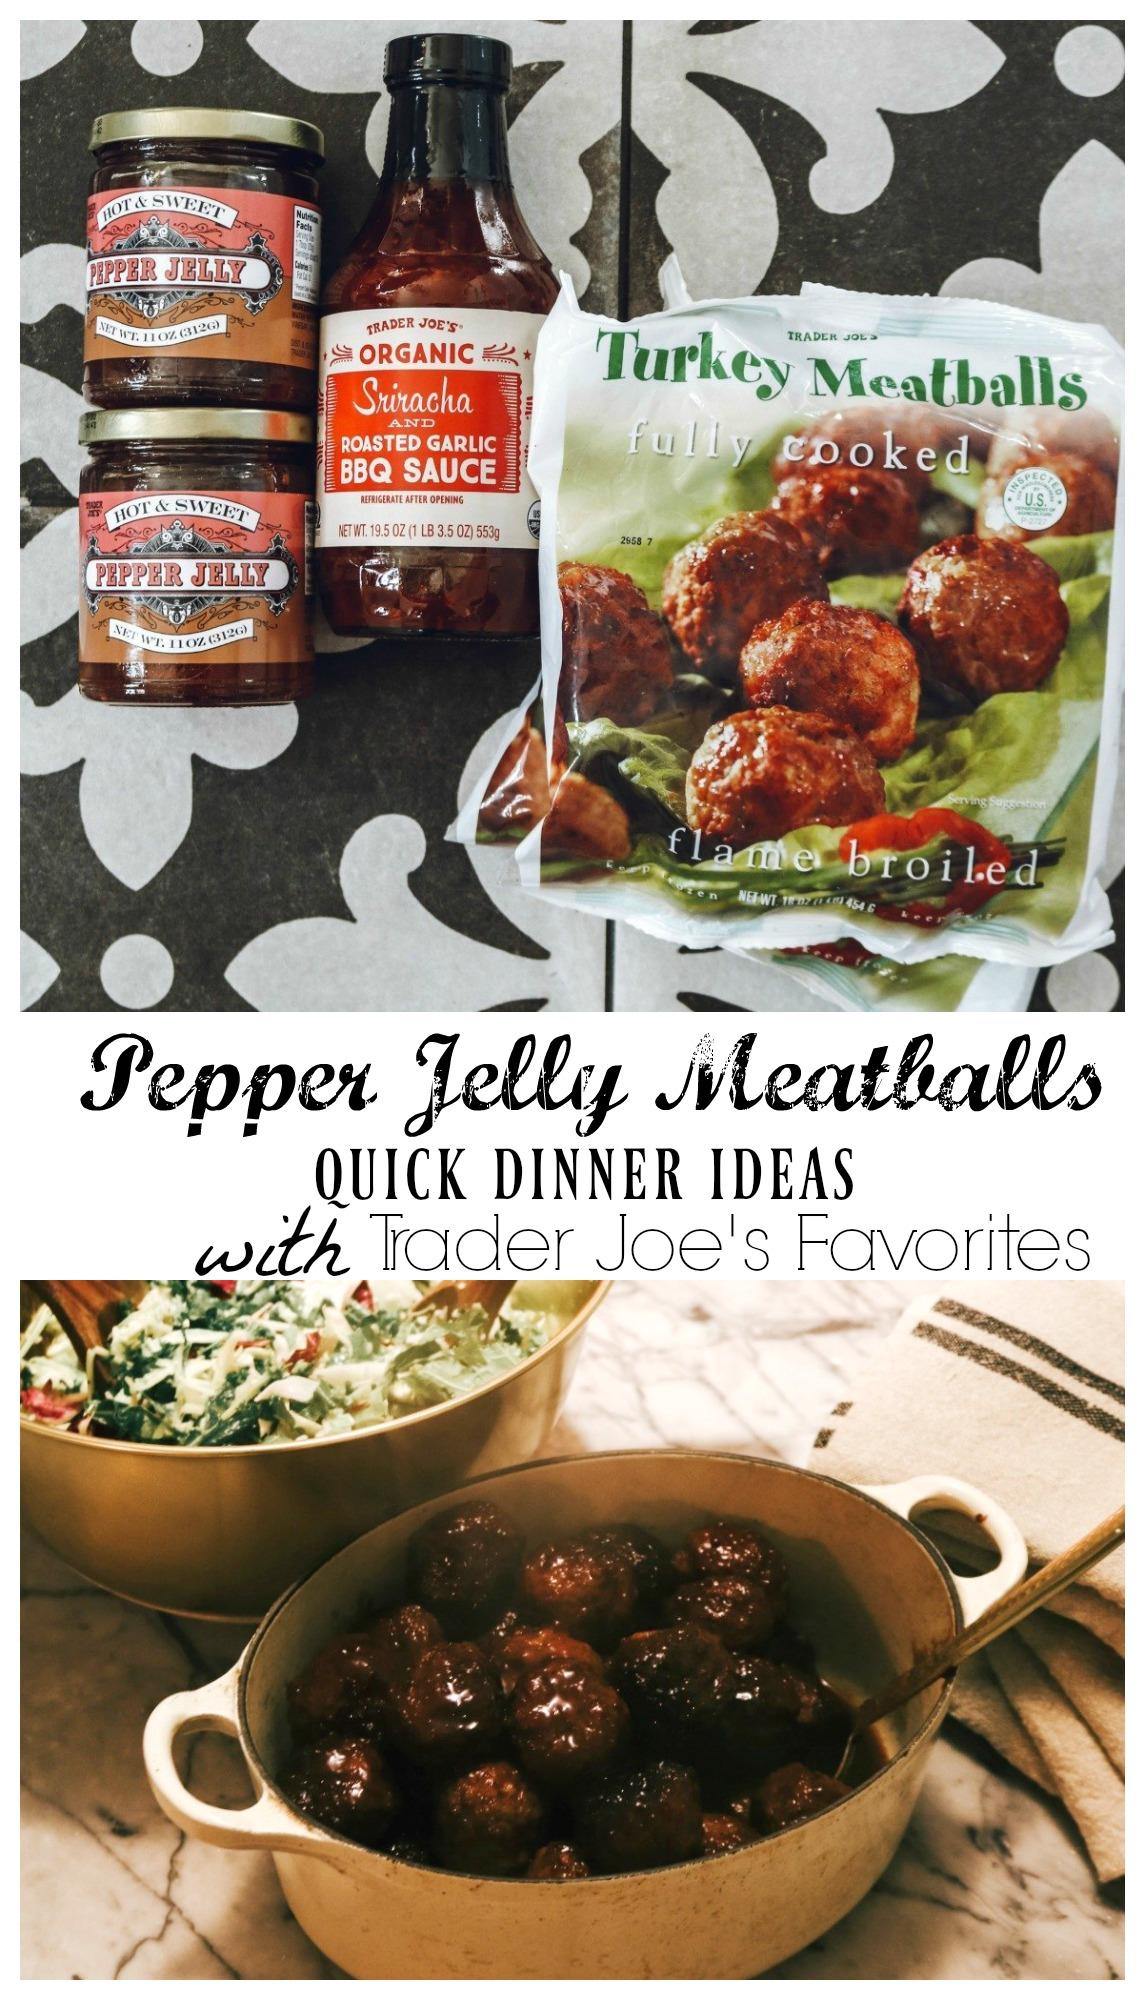 Trader Joe's Favorite Dinner Ideas- Pepper Jelly Meatballs